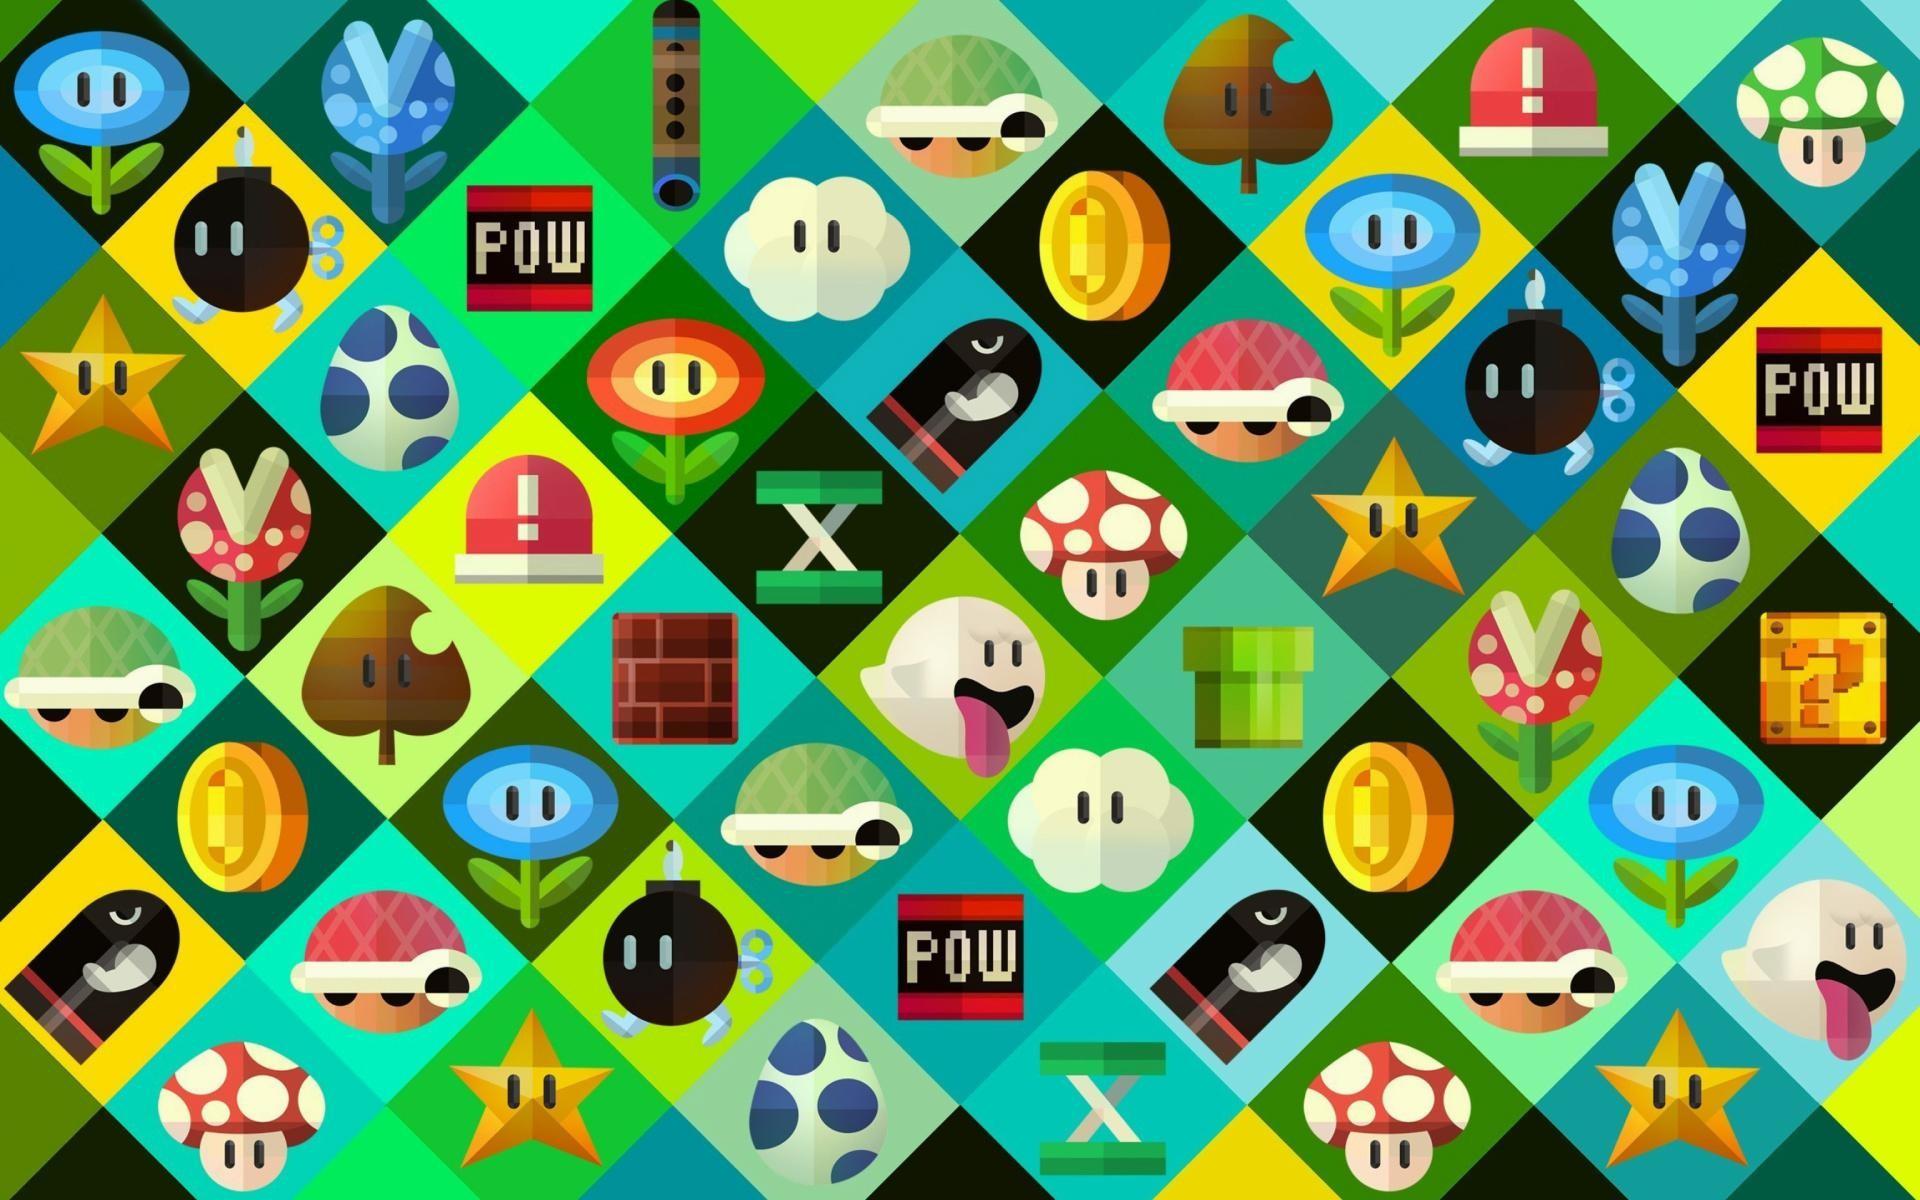 wallpaper.wiki-Super-Mario-power-ups-Abilities-in-